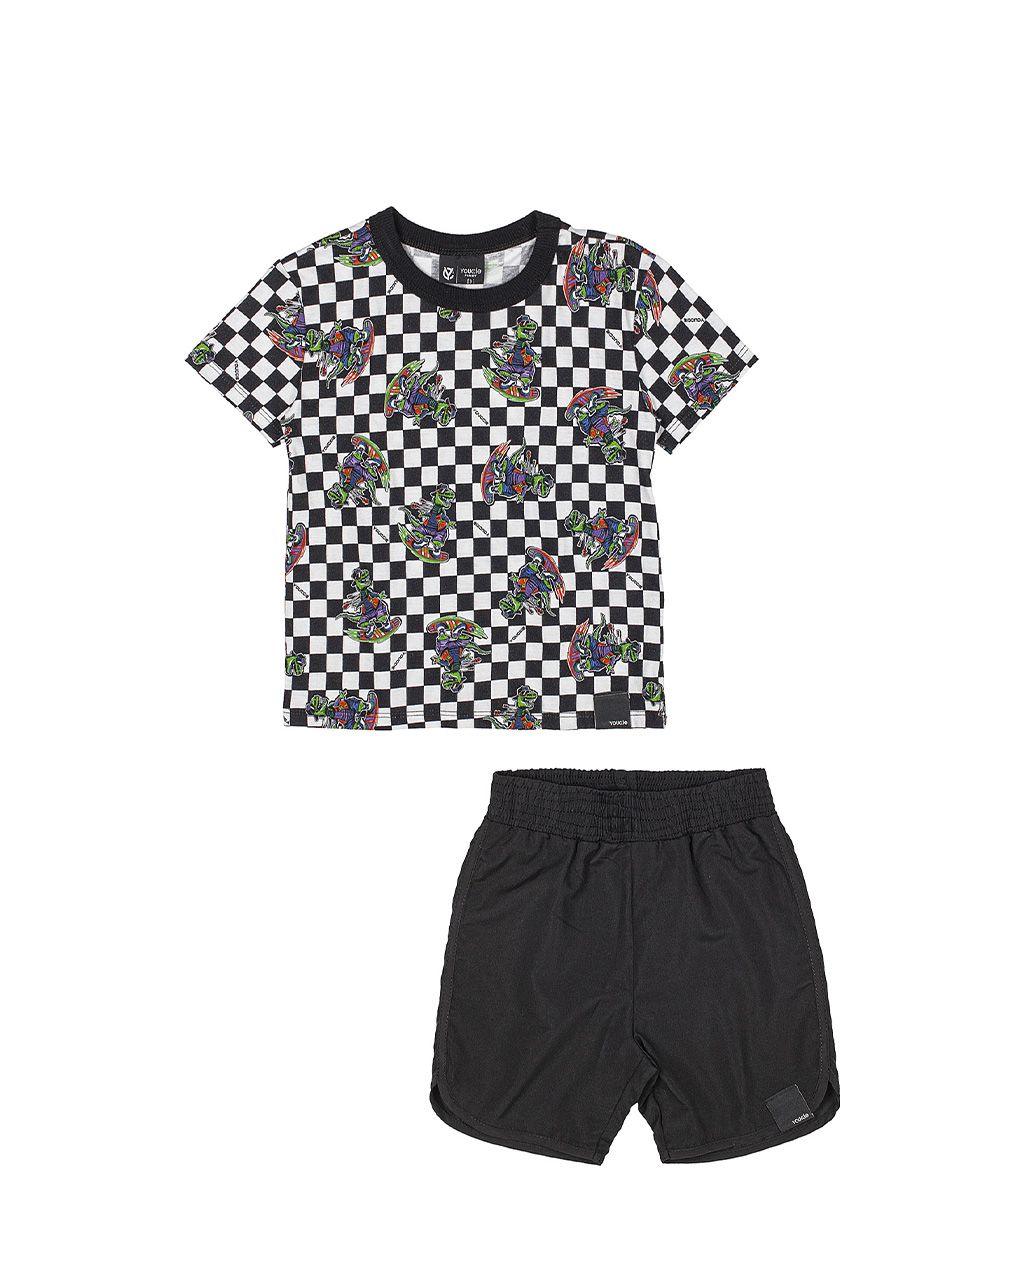 Conjunto Infantil Quadriculado Blusa e Shorts Preto Youccie